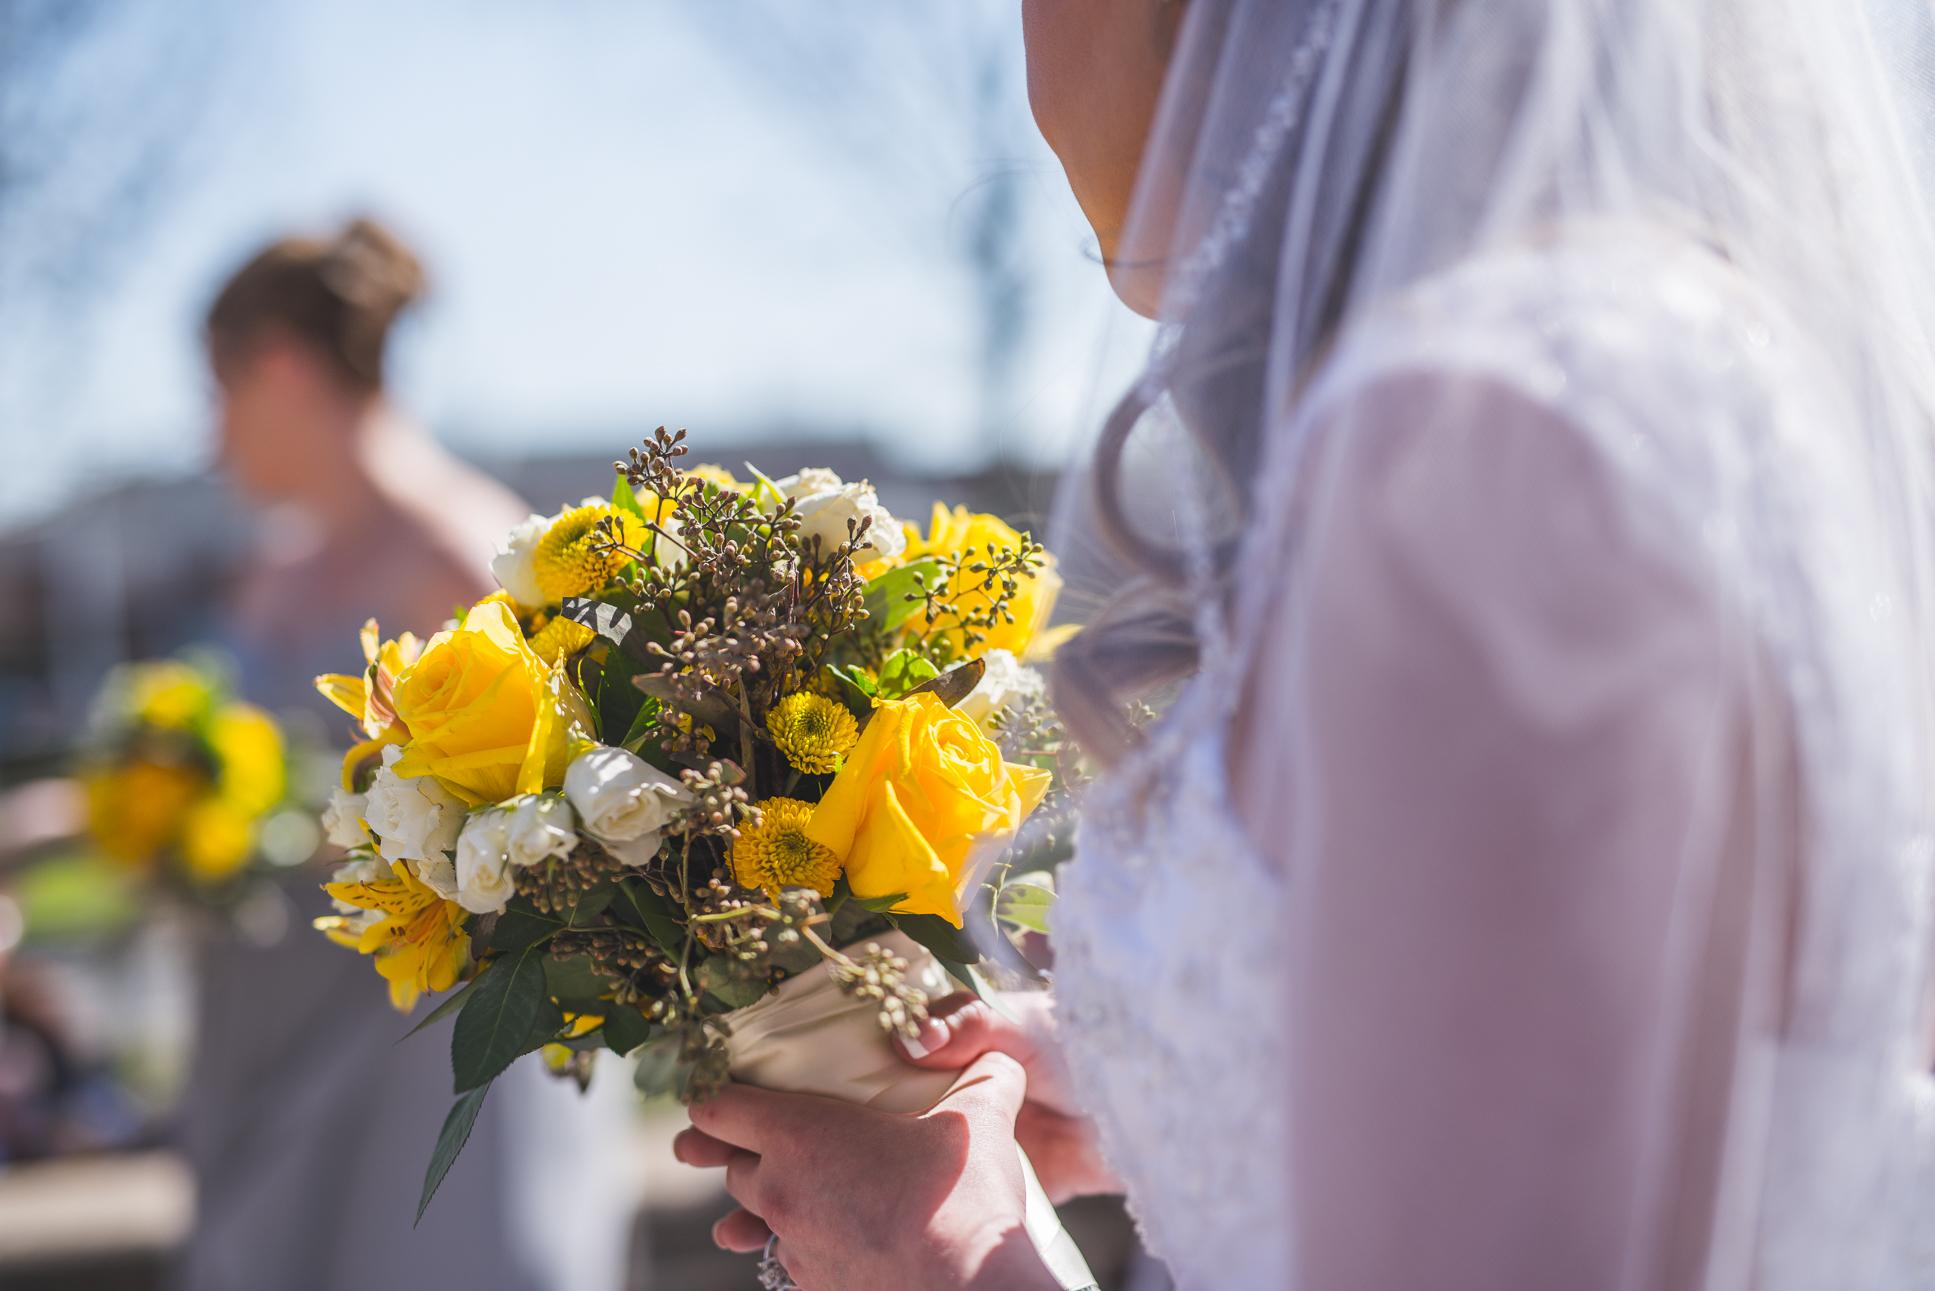 Karle & Josh Wedding - Dustin Morrison Photography-14.jpg